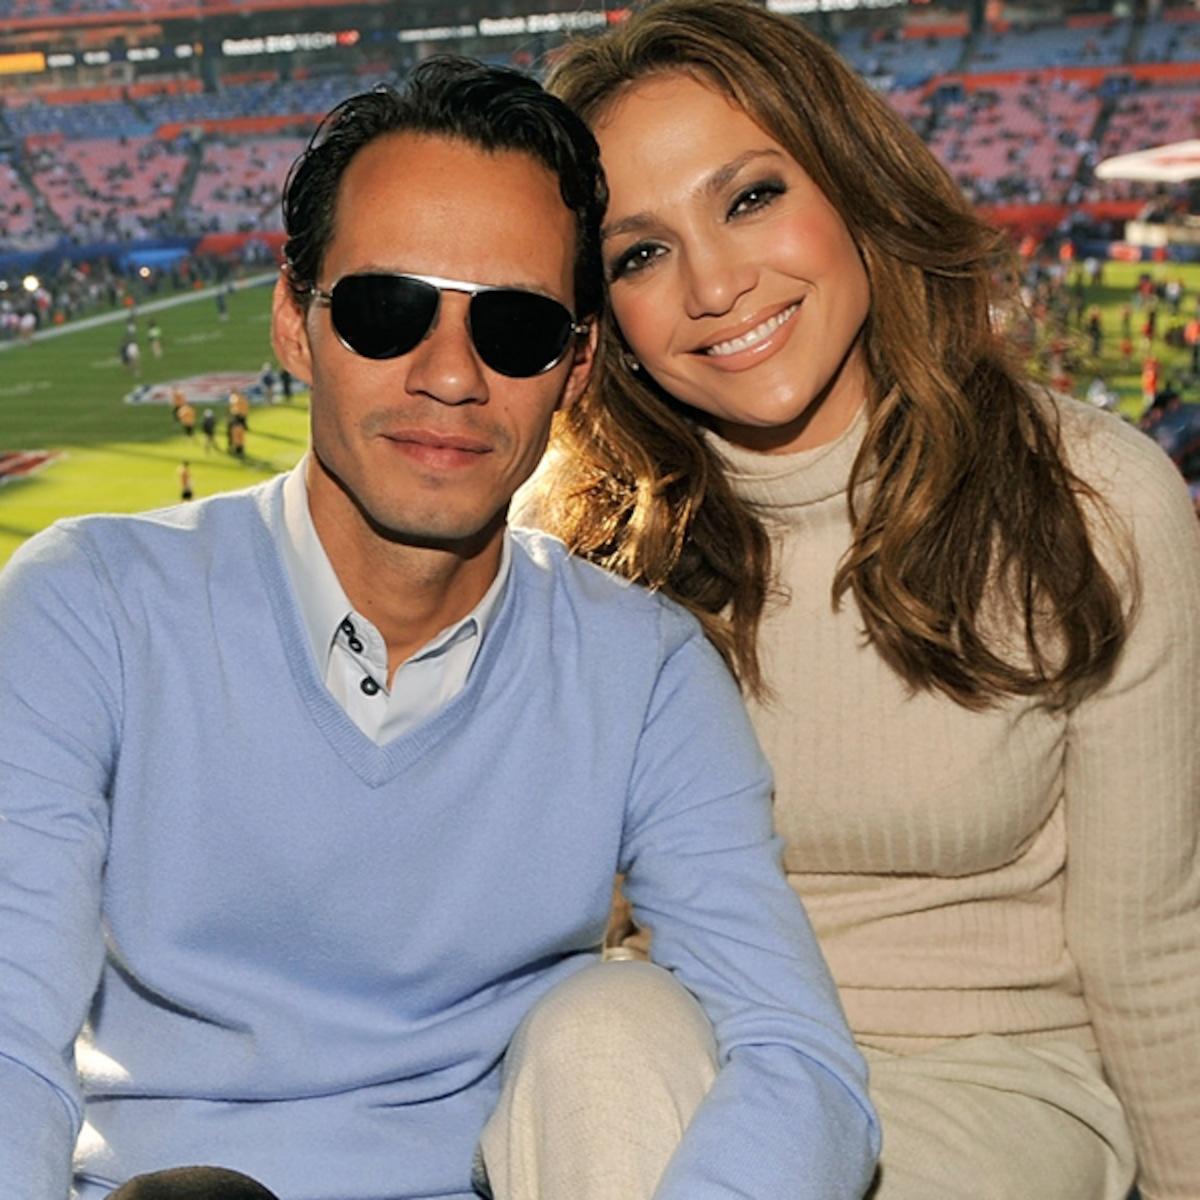 La fuerte confesión de Jennifer Lopez sobre su matrimonio con Marc Anthony  - E! Online Latino - MX